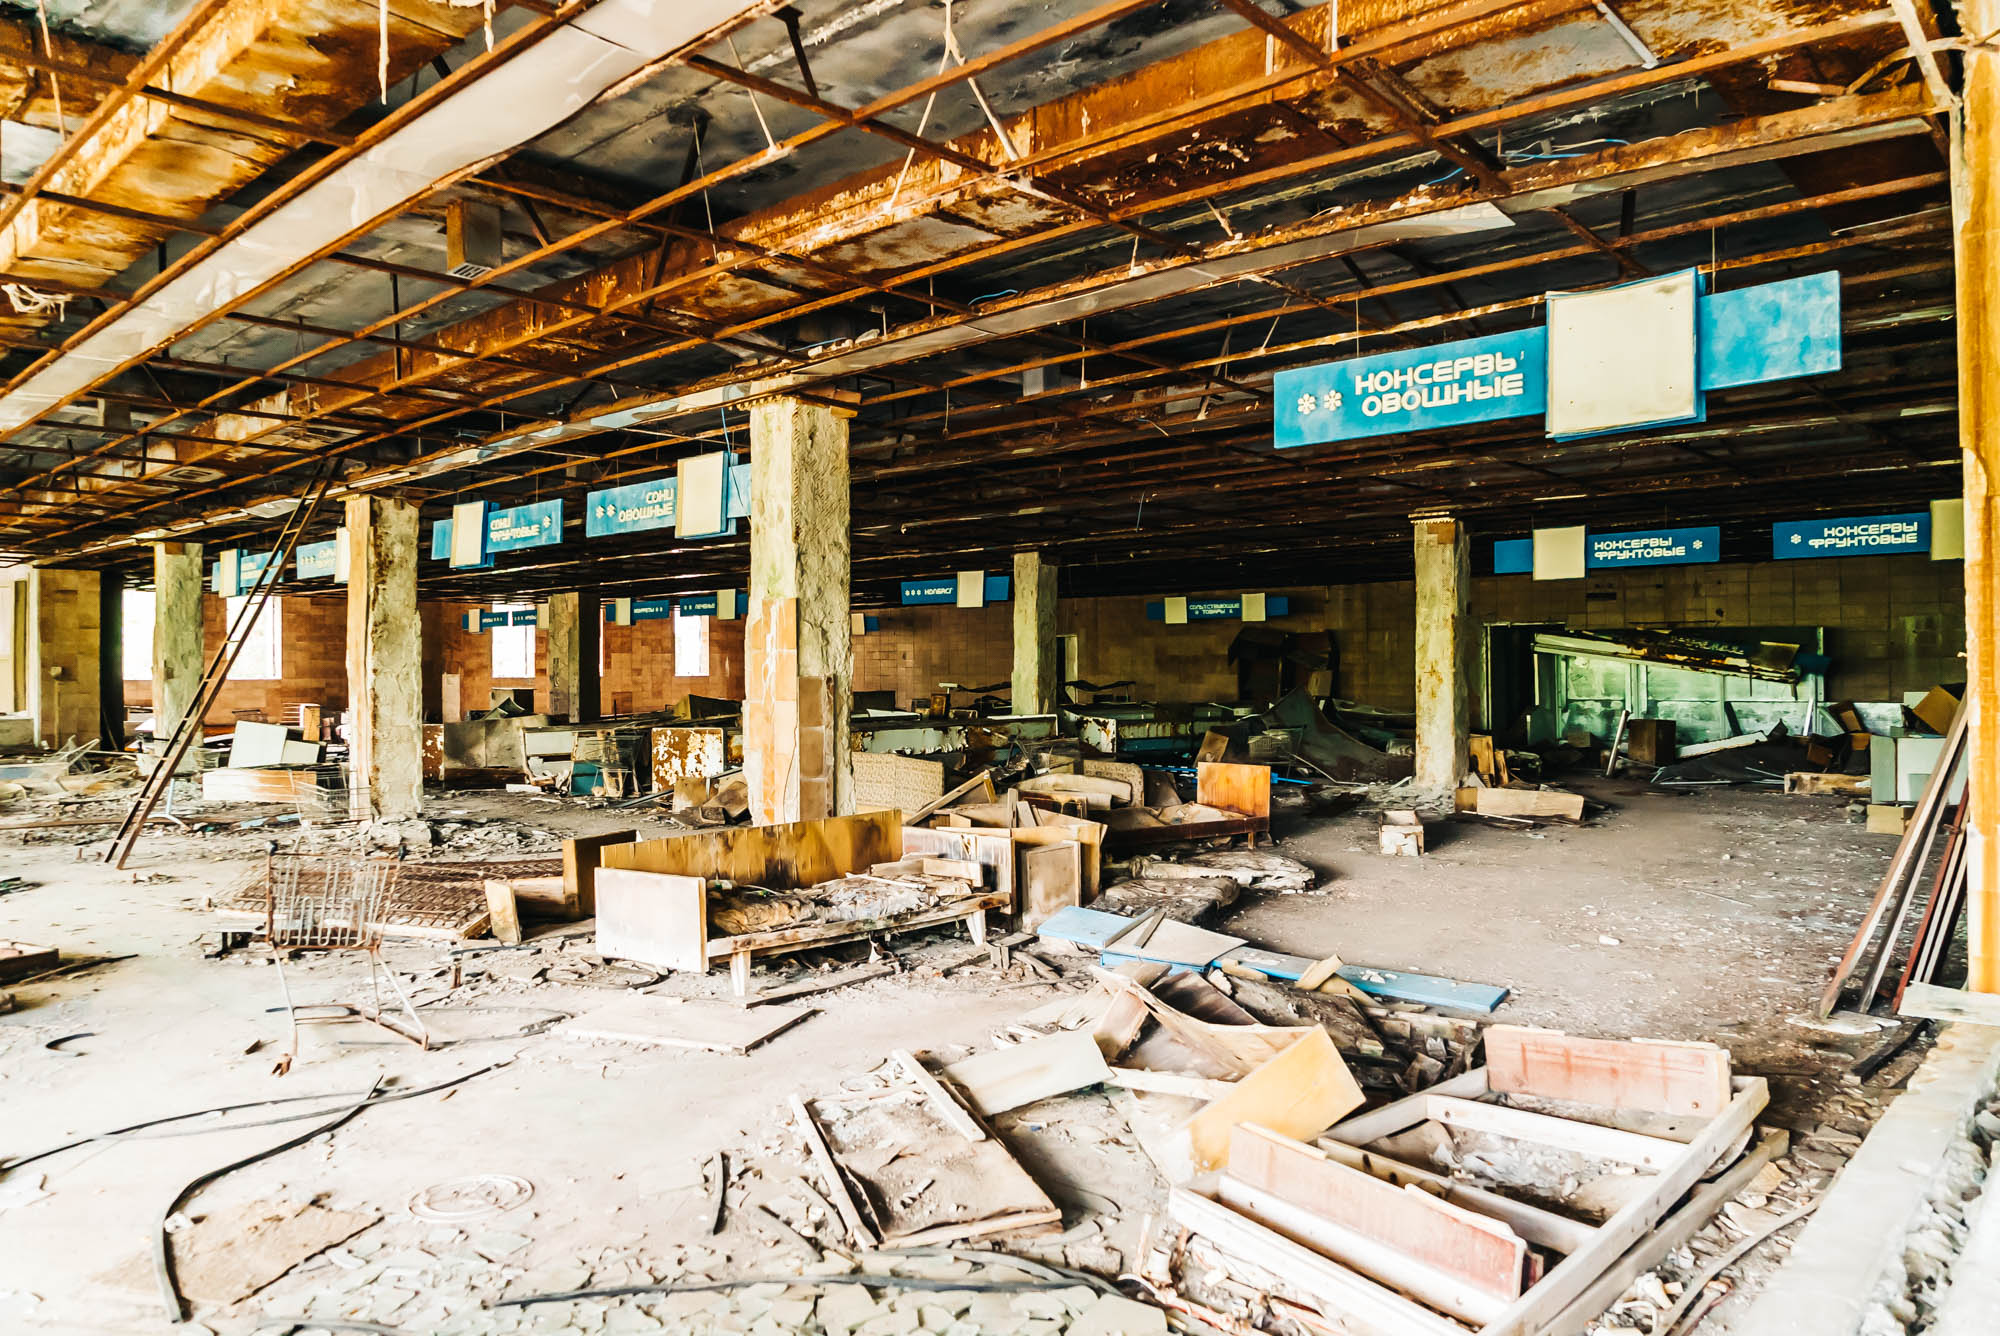 Abandoned supermarket in Pripyat